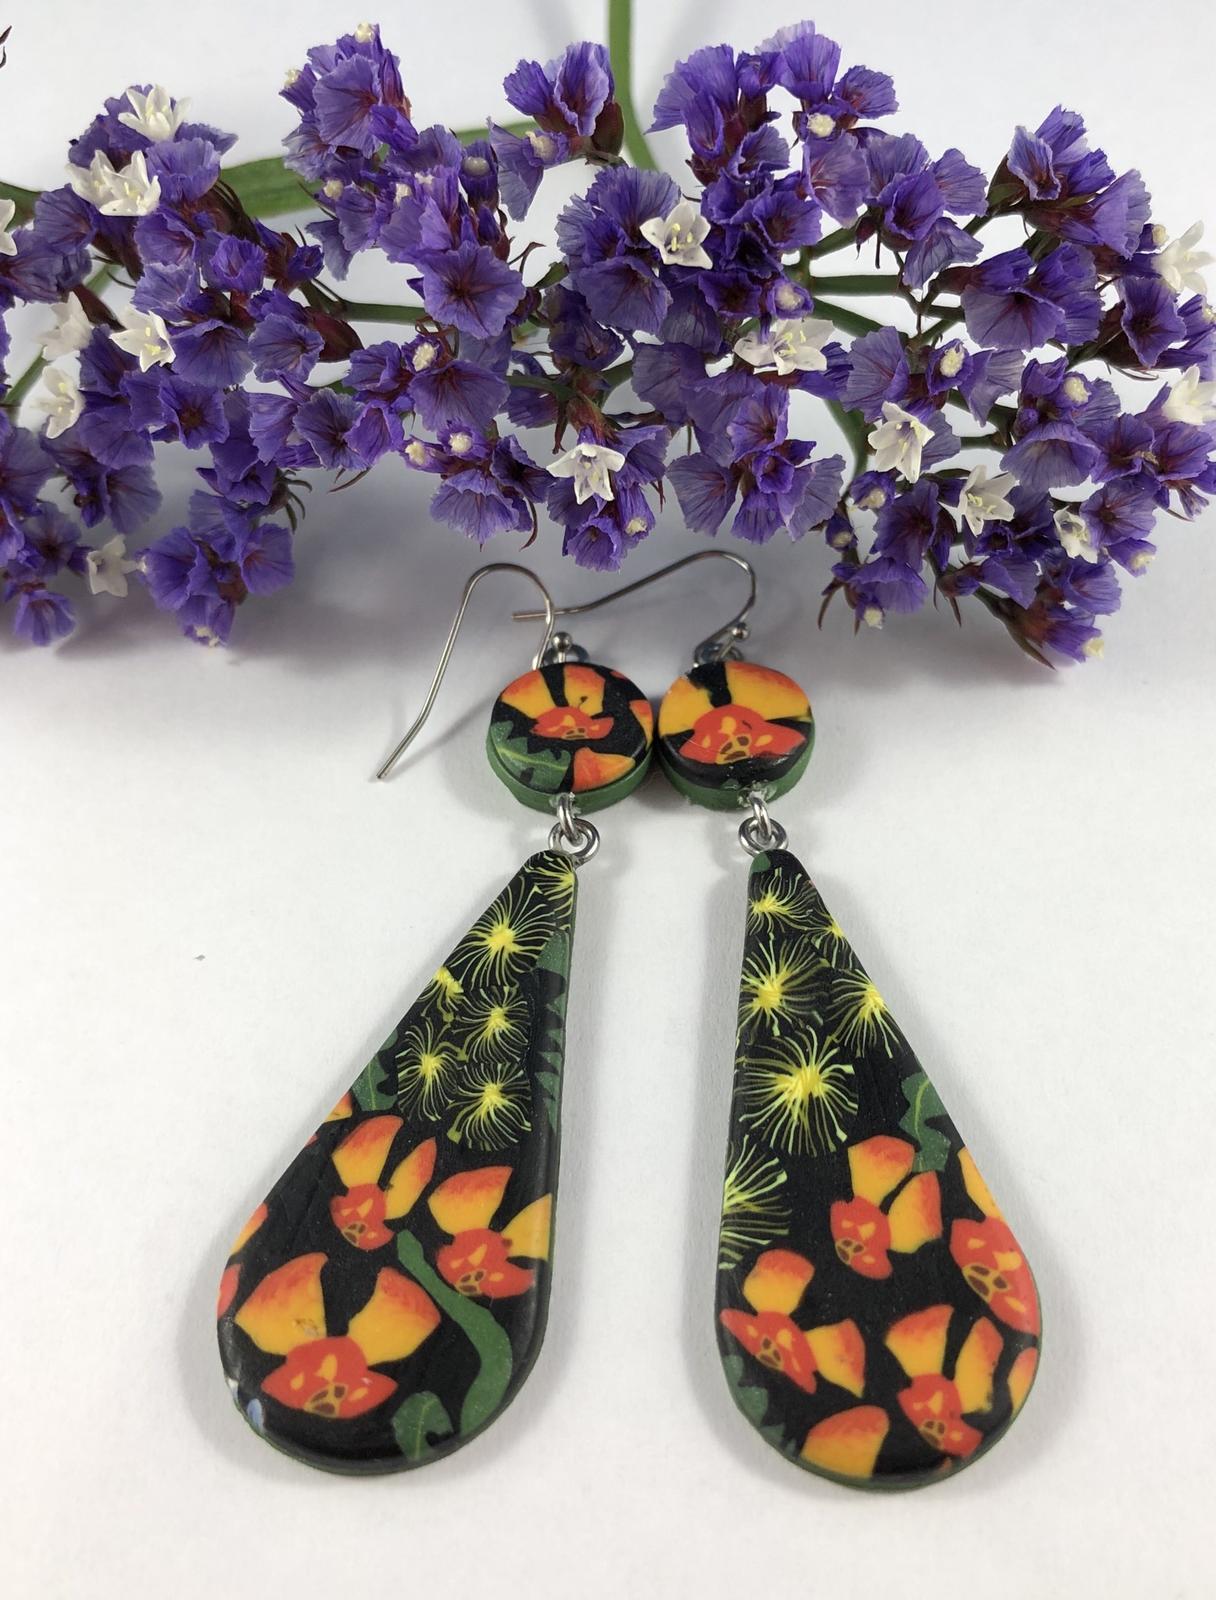 Wildflower earrings